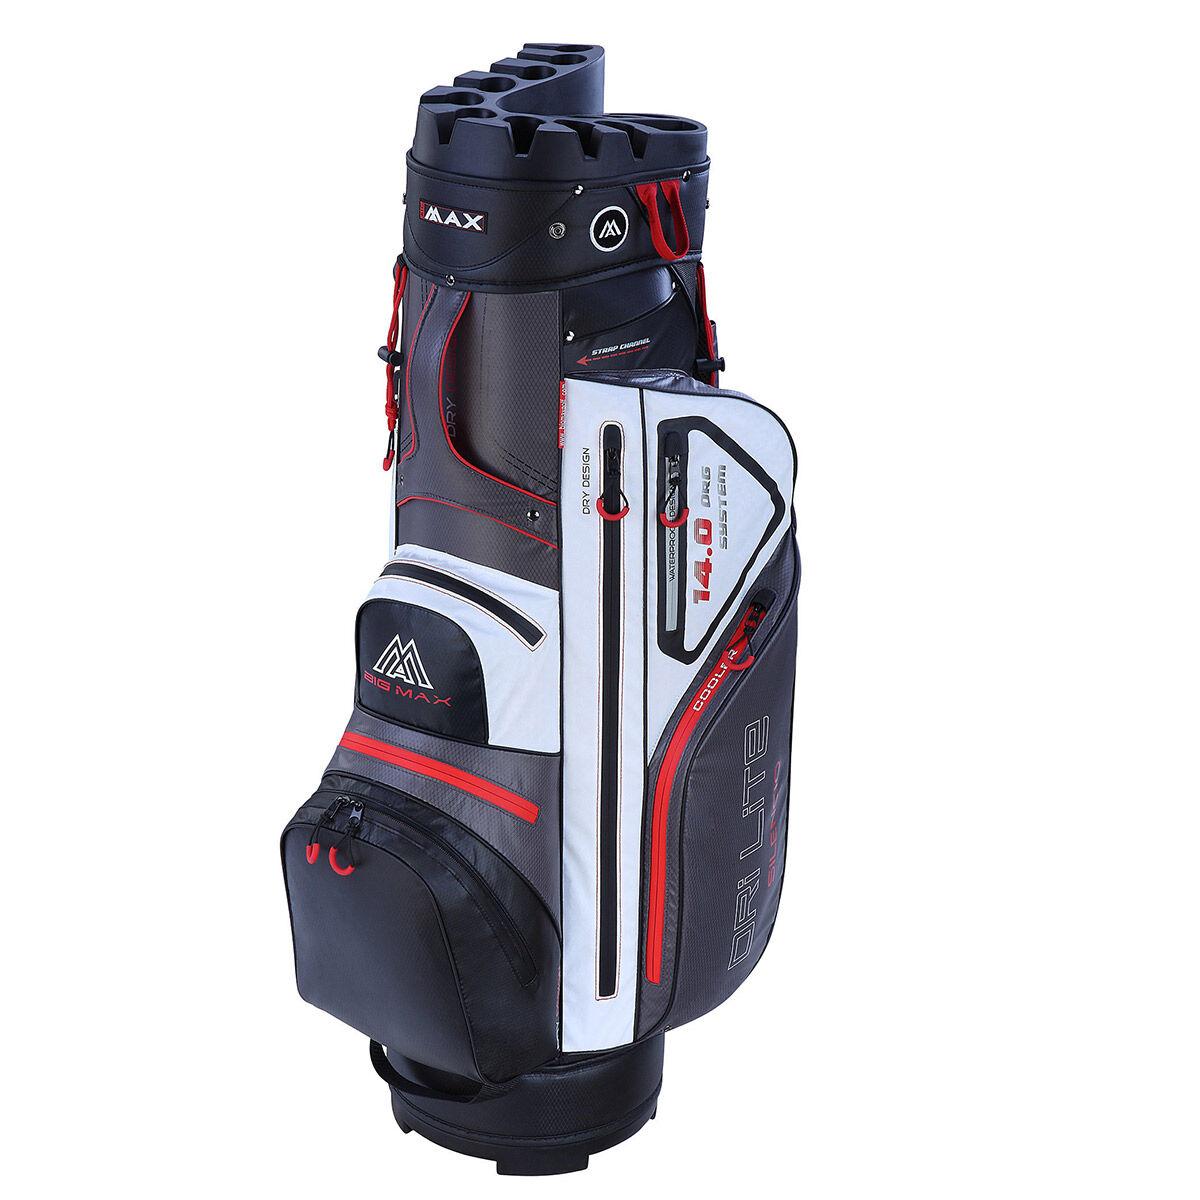 BIG MAX Dri Lite Silencio Golf Cart Bag, Charcoal/black/white/red, One Size | American Golf